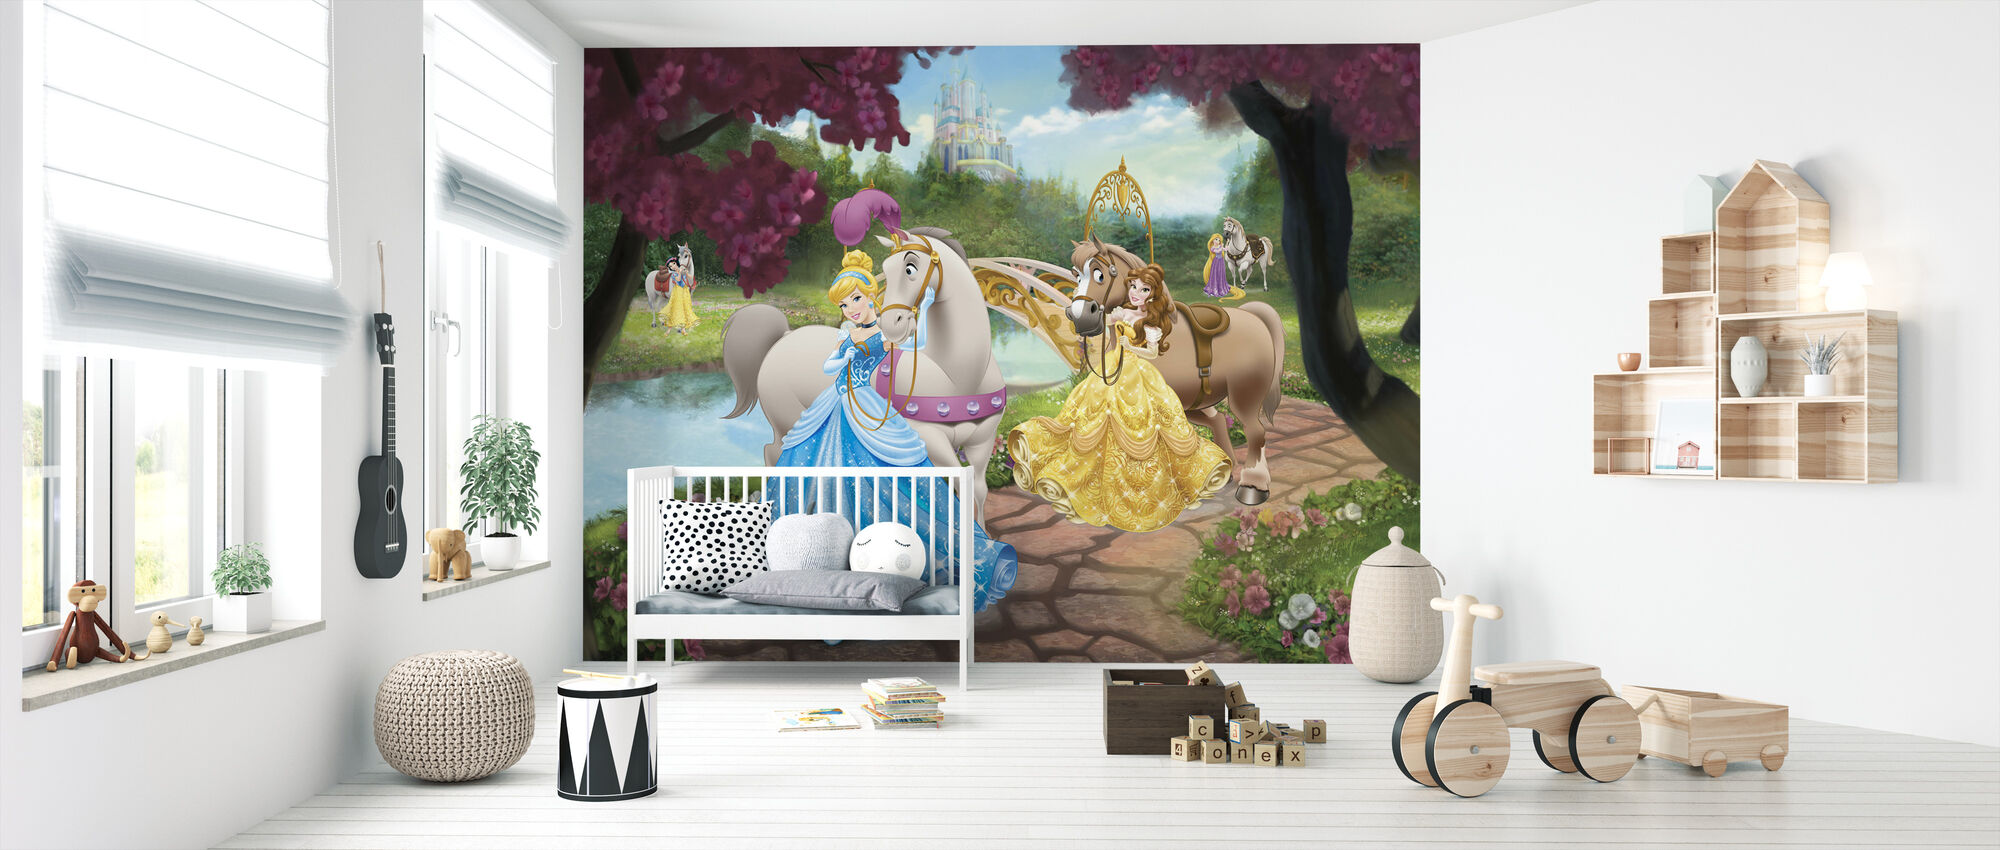 Disney Princess - Hevoset - Tapetti - Vauvan huone